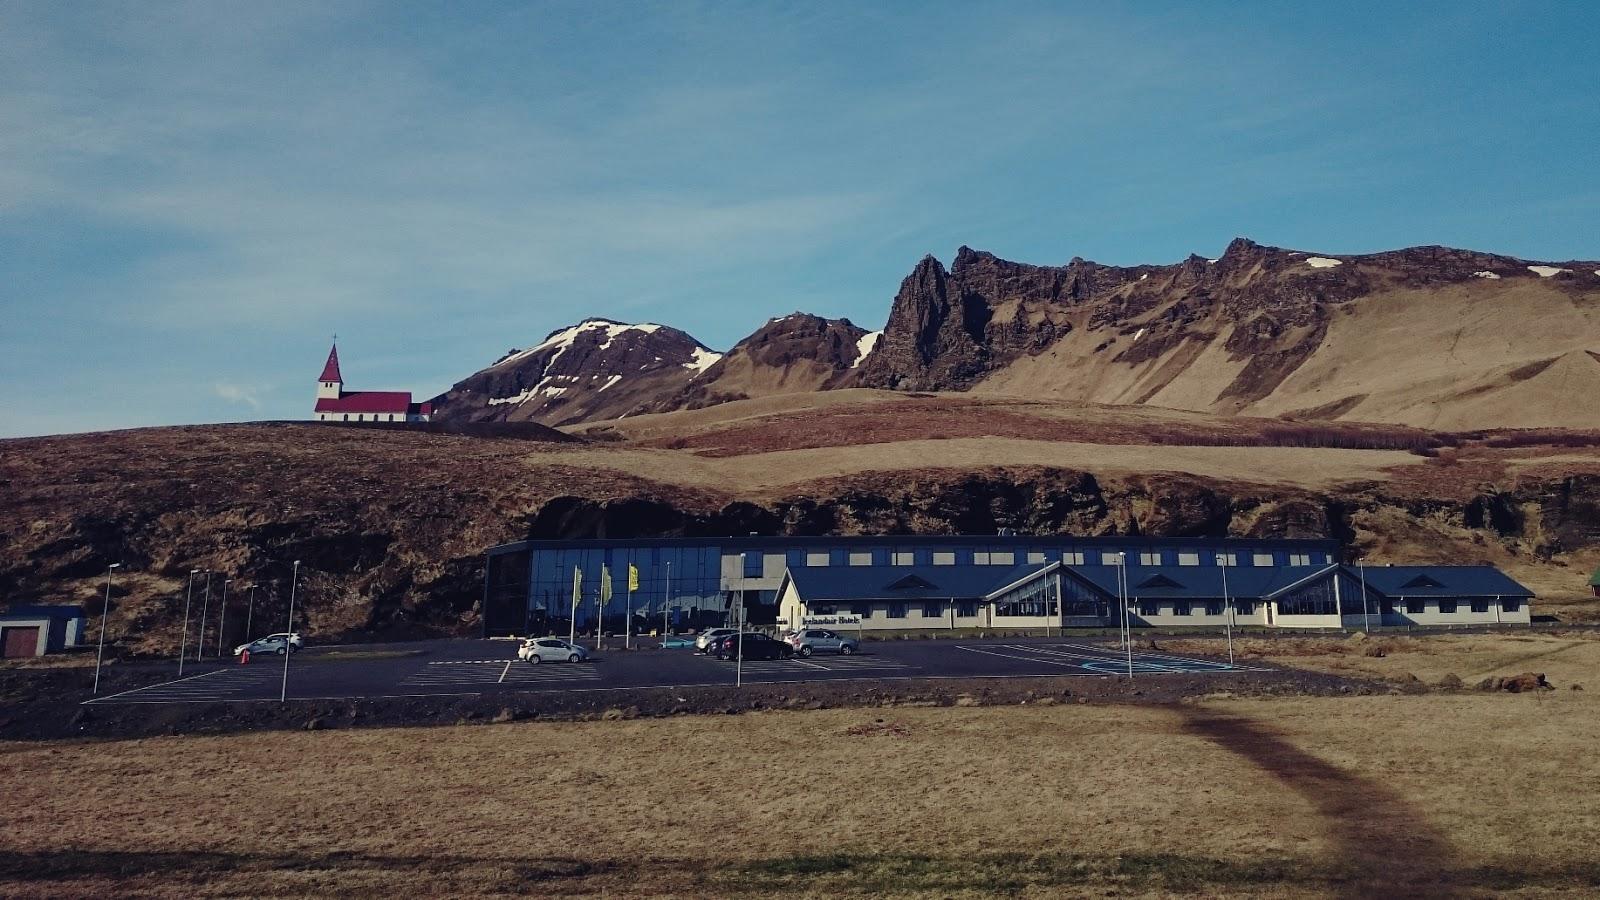 miasteczko Vik, krajobraz Islandii, Islandia